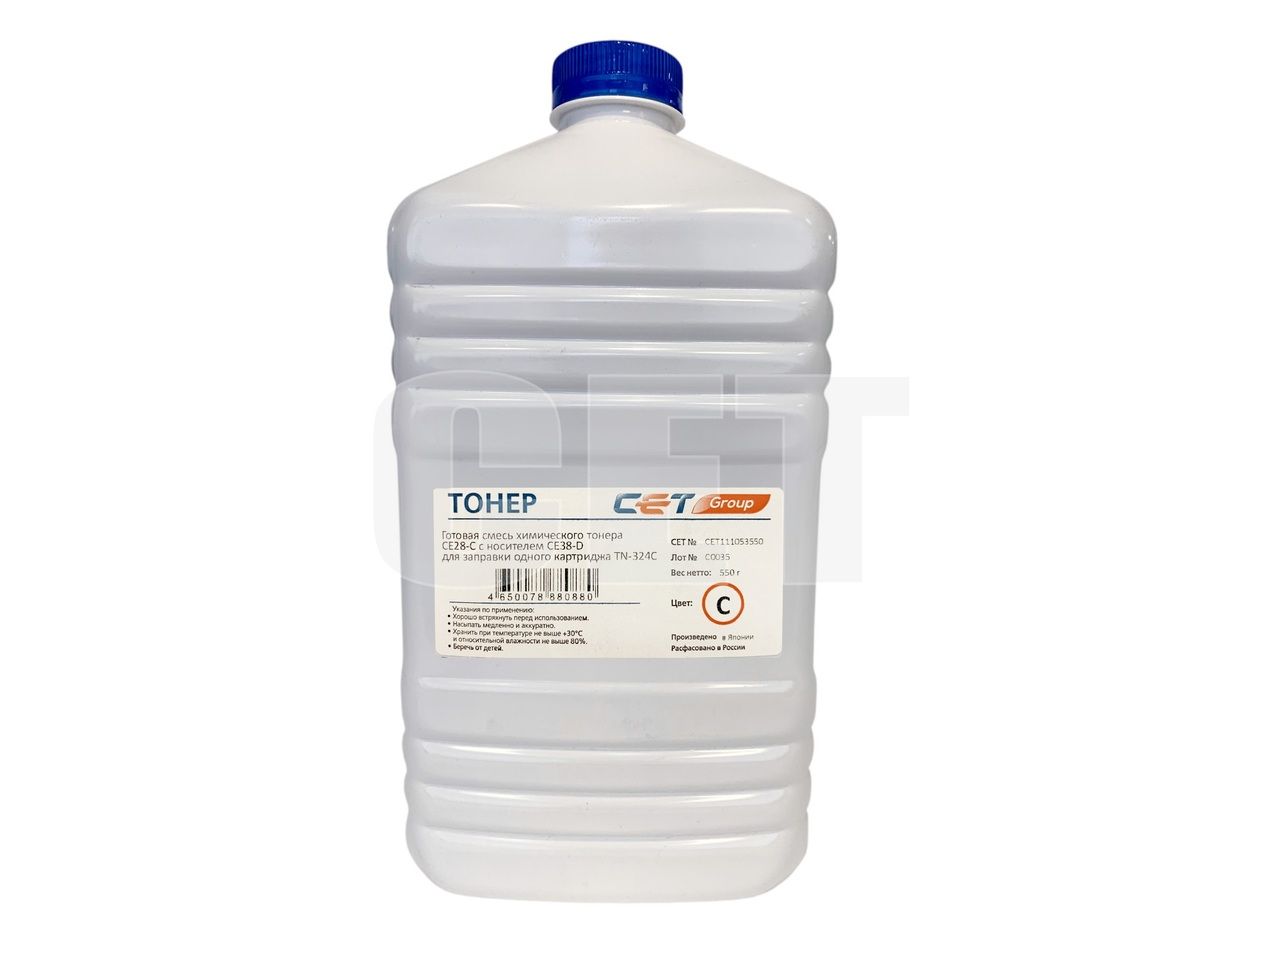 Тонер (CPT) + носитель CE28 для KONICA MINOLTA BizhubC258/308/368 (Japan) Cyan, 550г/бут, CET111053550